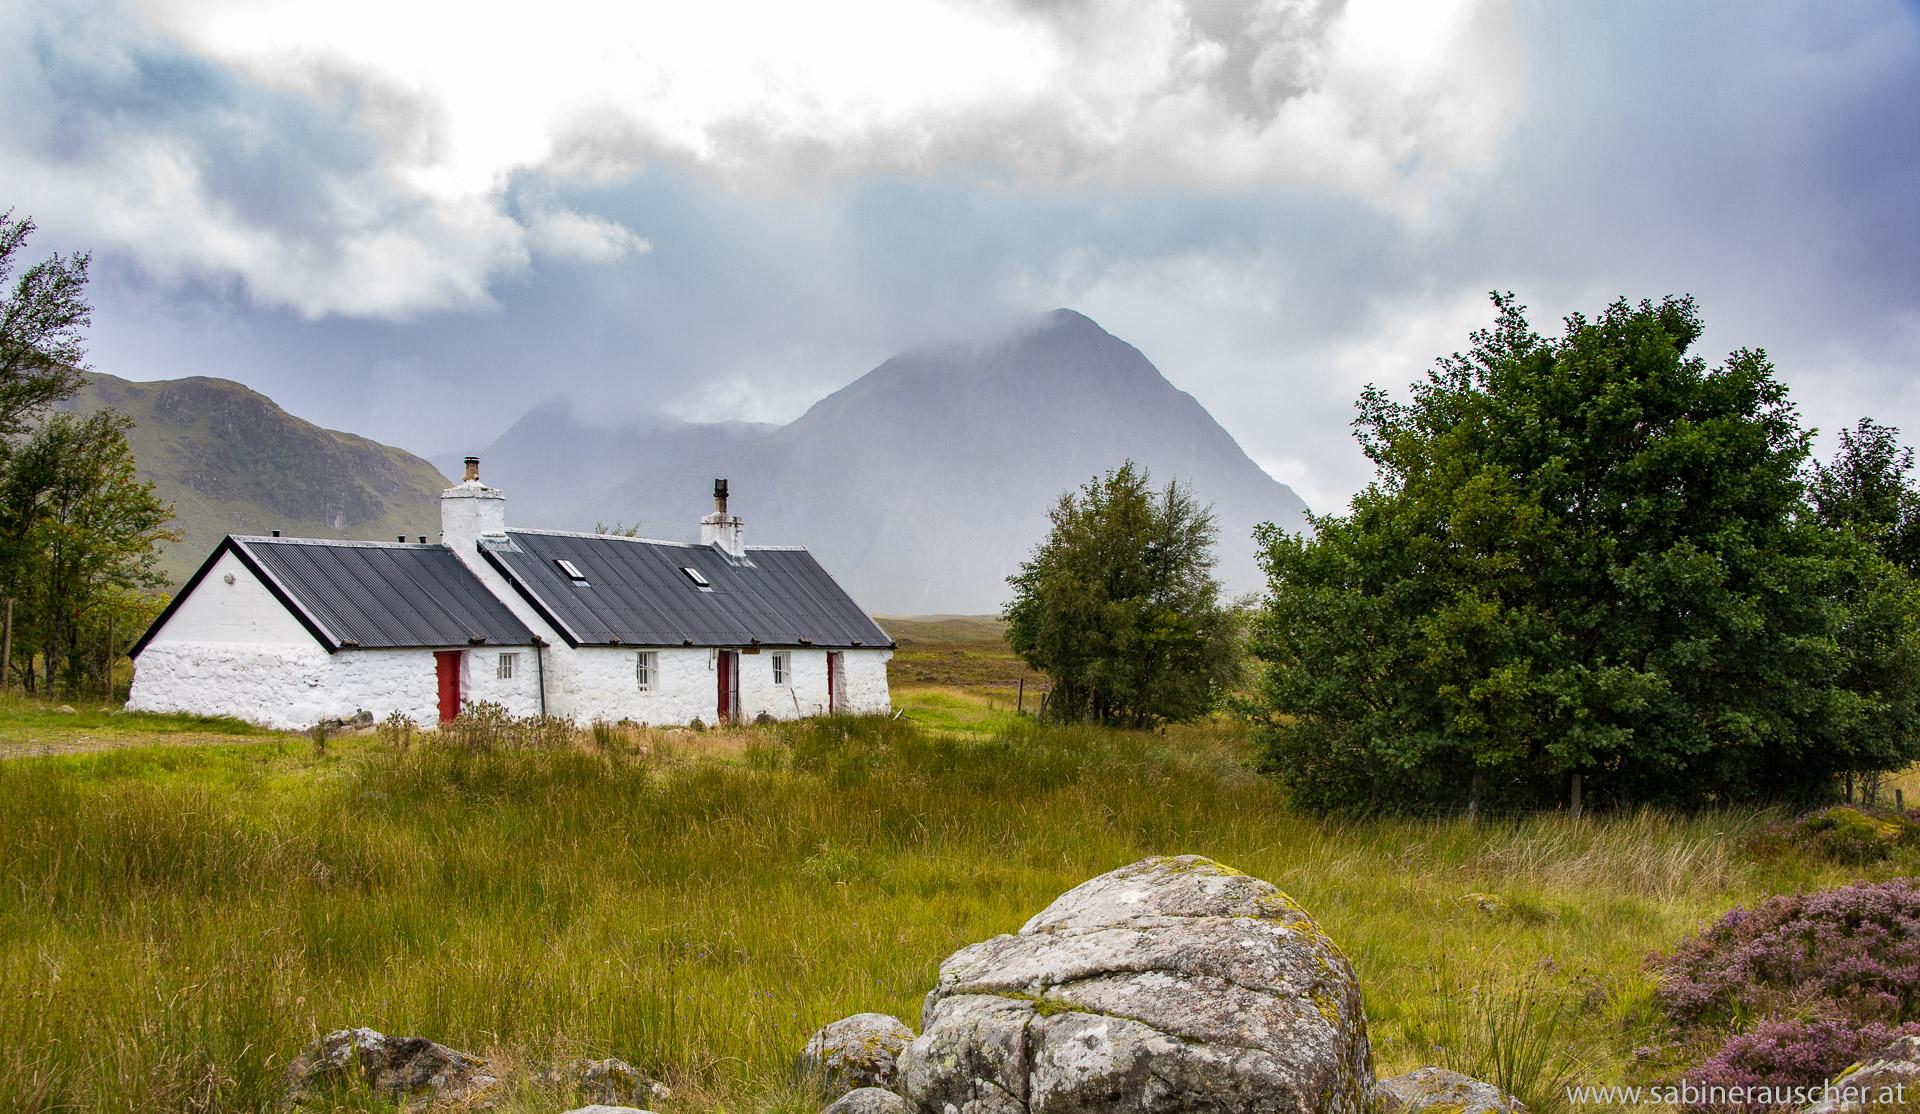 Blackrock Cottage in Glen Coe